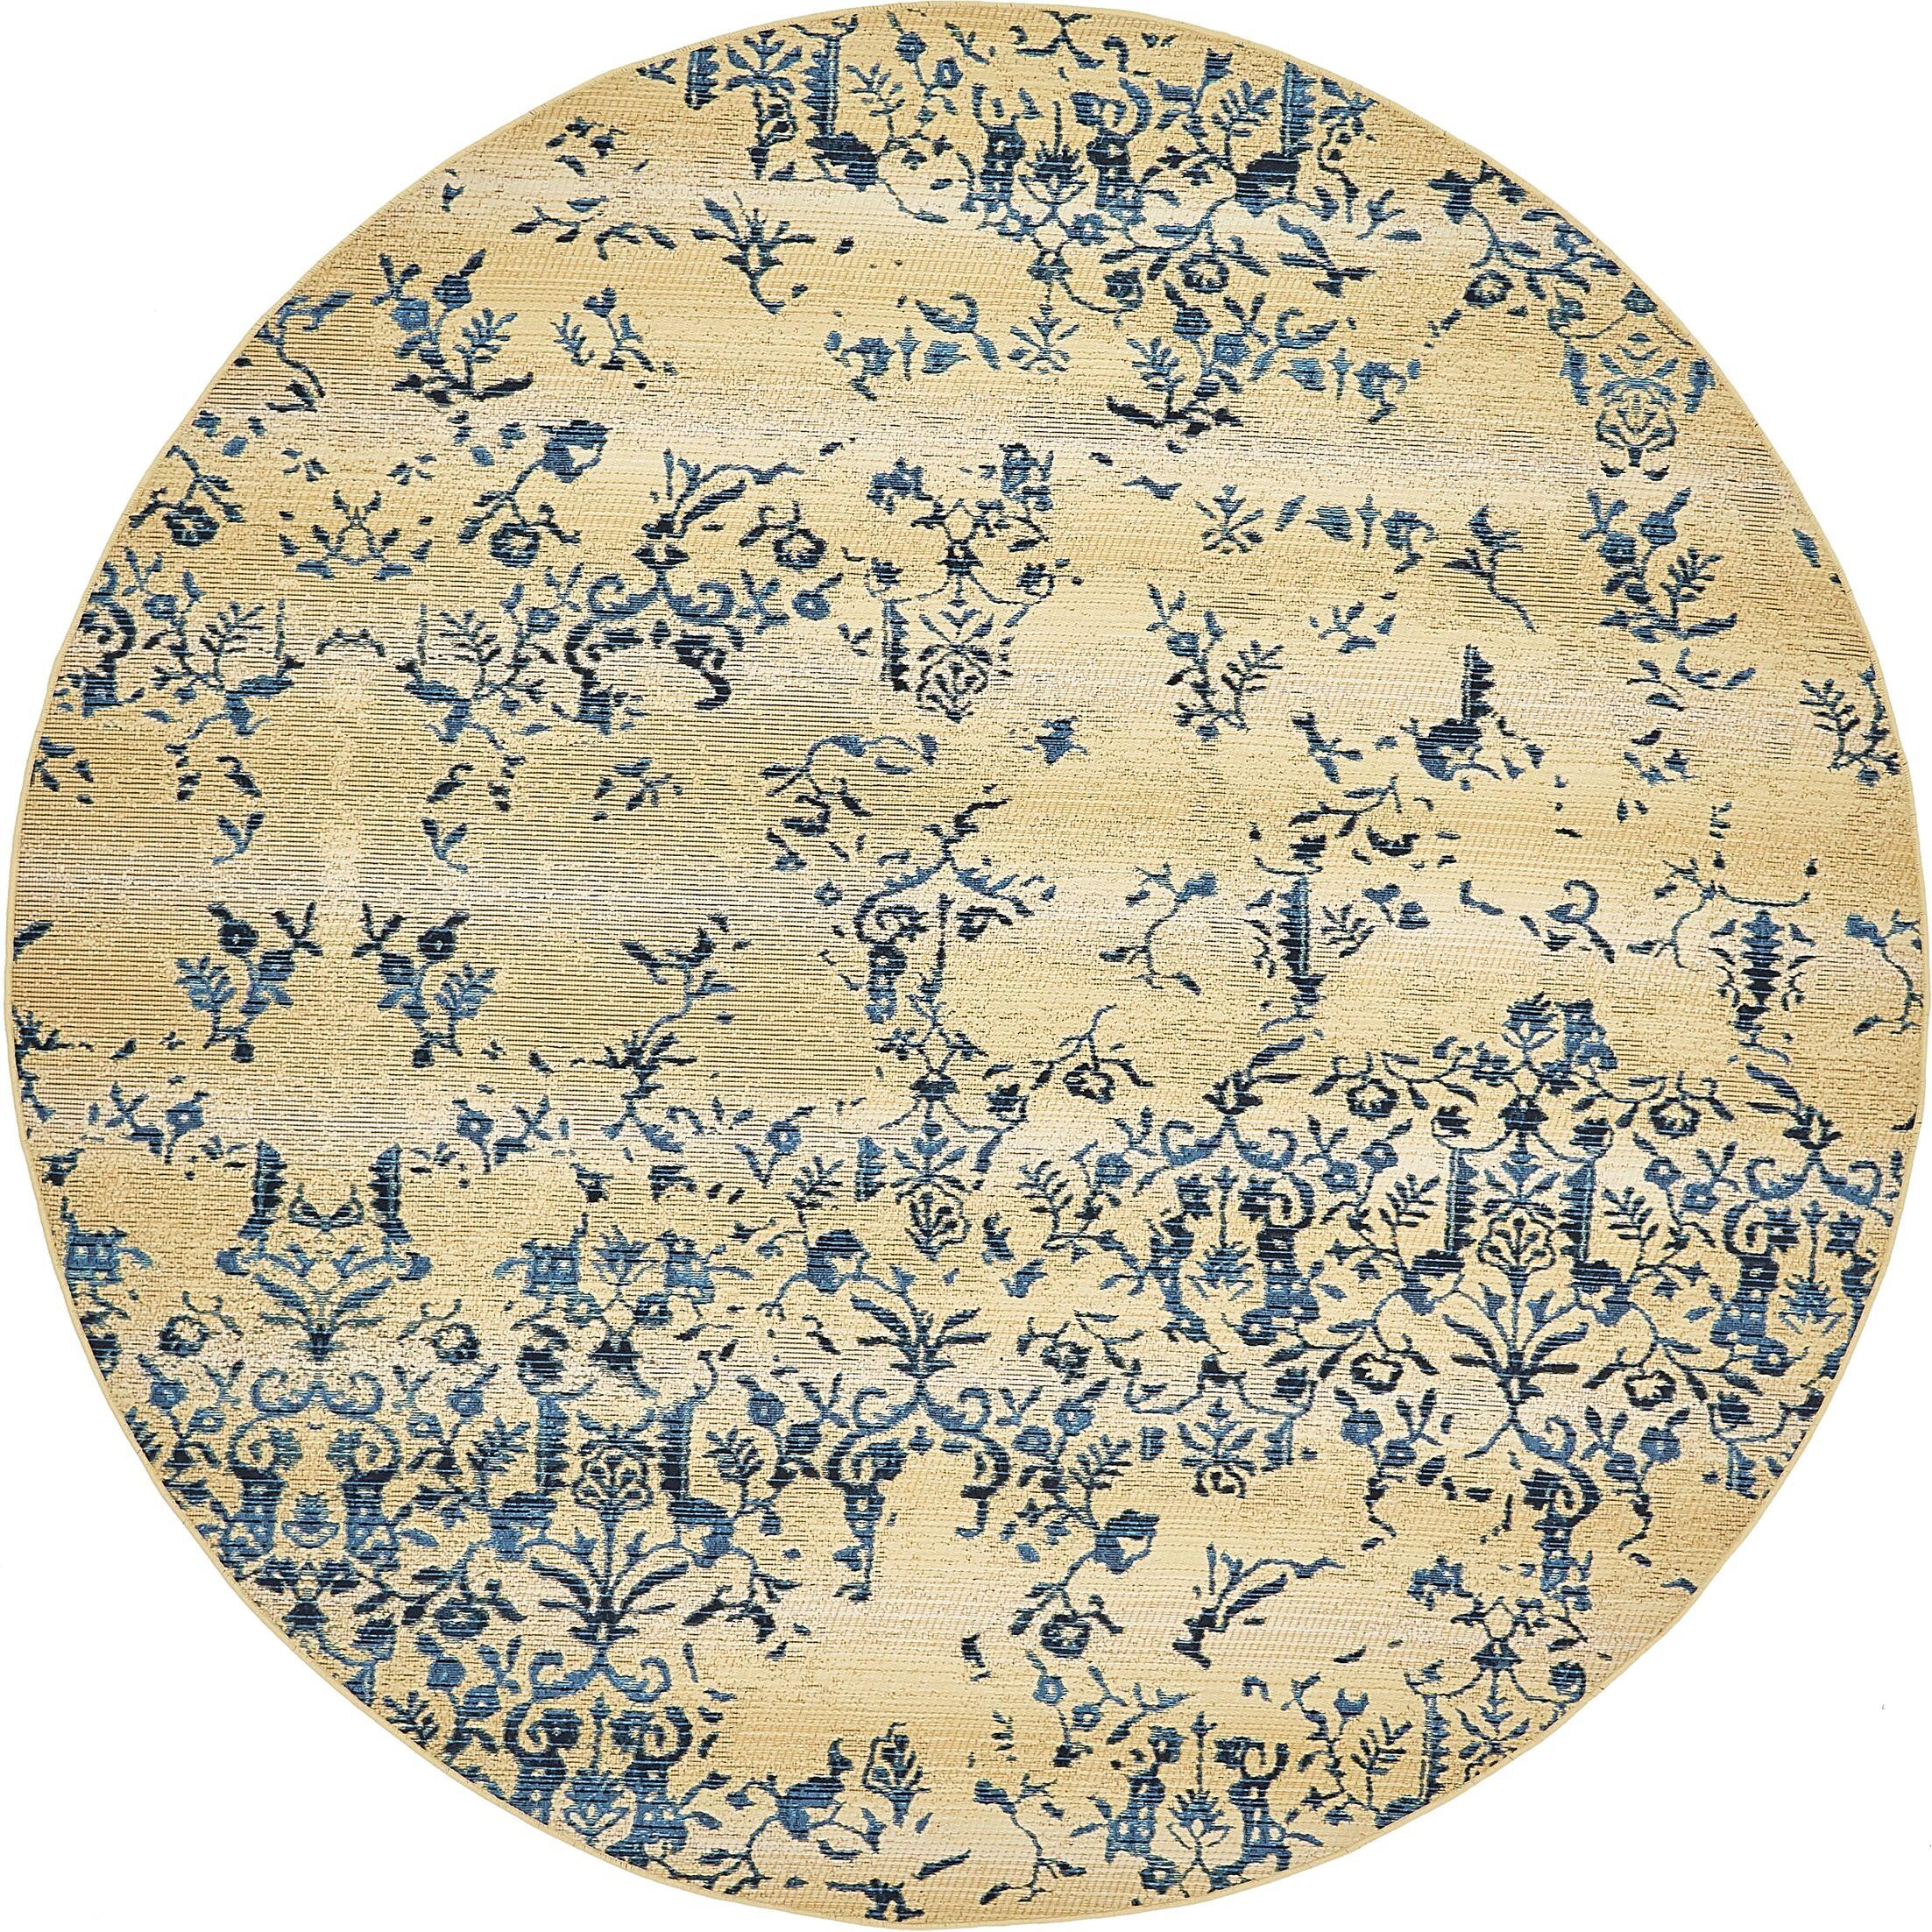 Eris Floral and Plants Beige Indoor/Outdoor Area Rug Rug Size: Round 8'